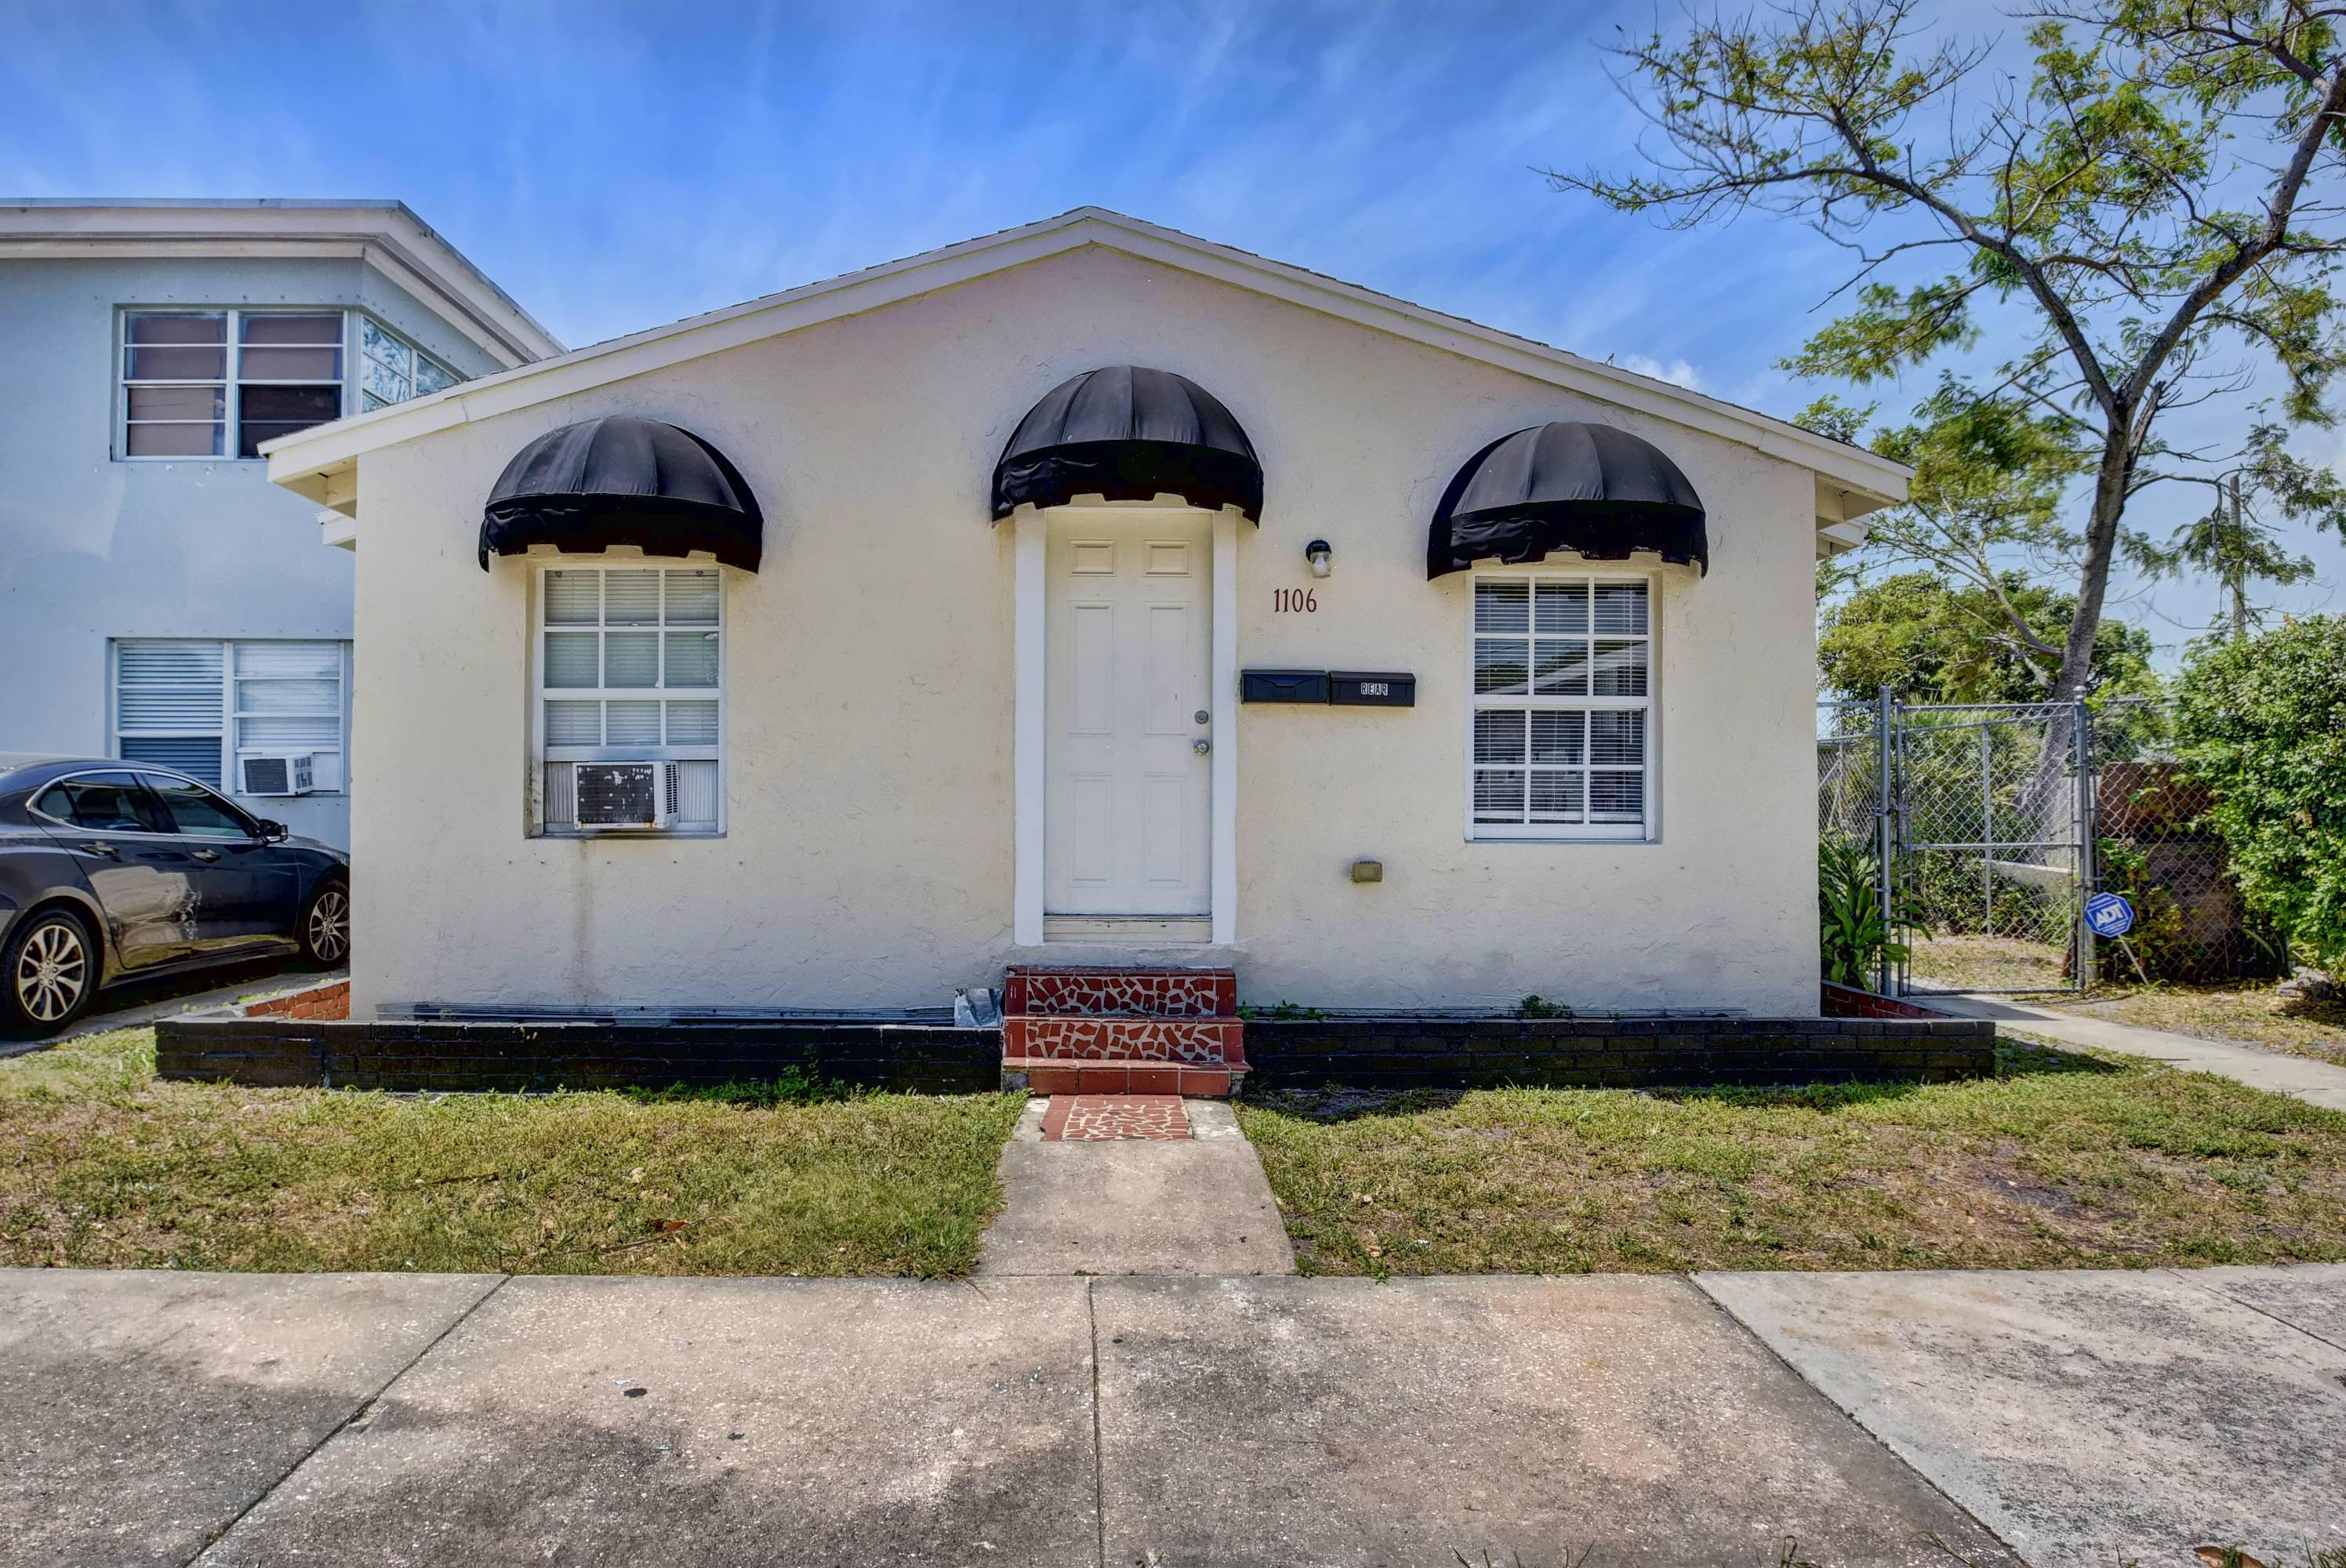 Details for 1106 18th Street 1, West Palm Beach, FL 33407